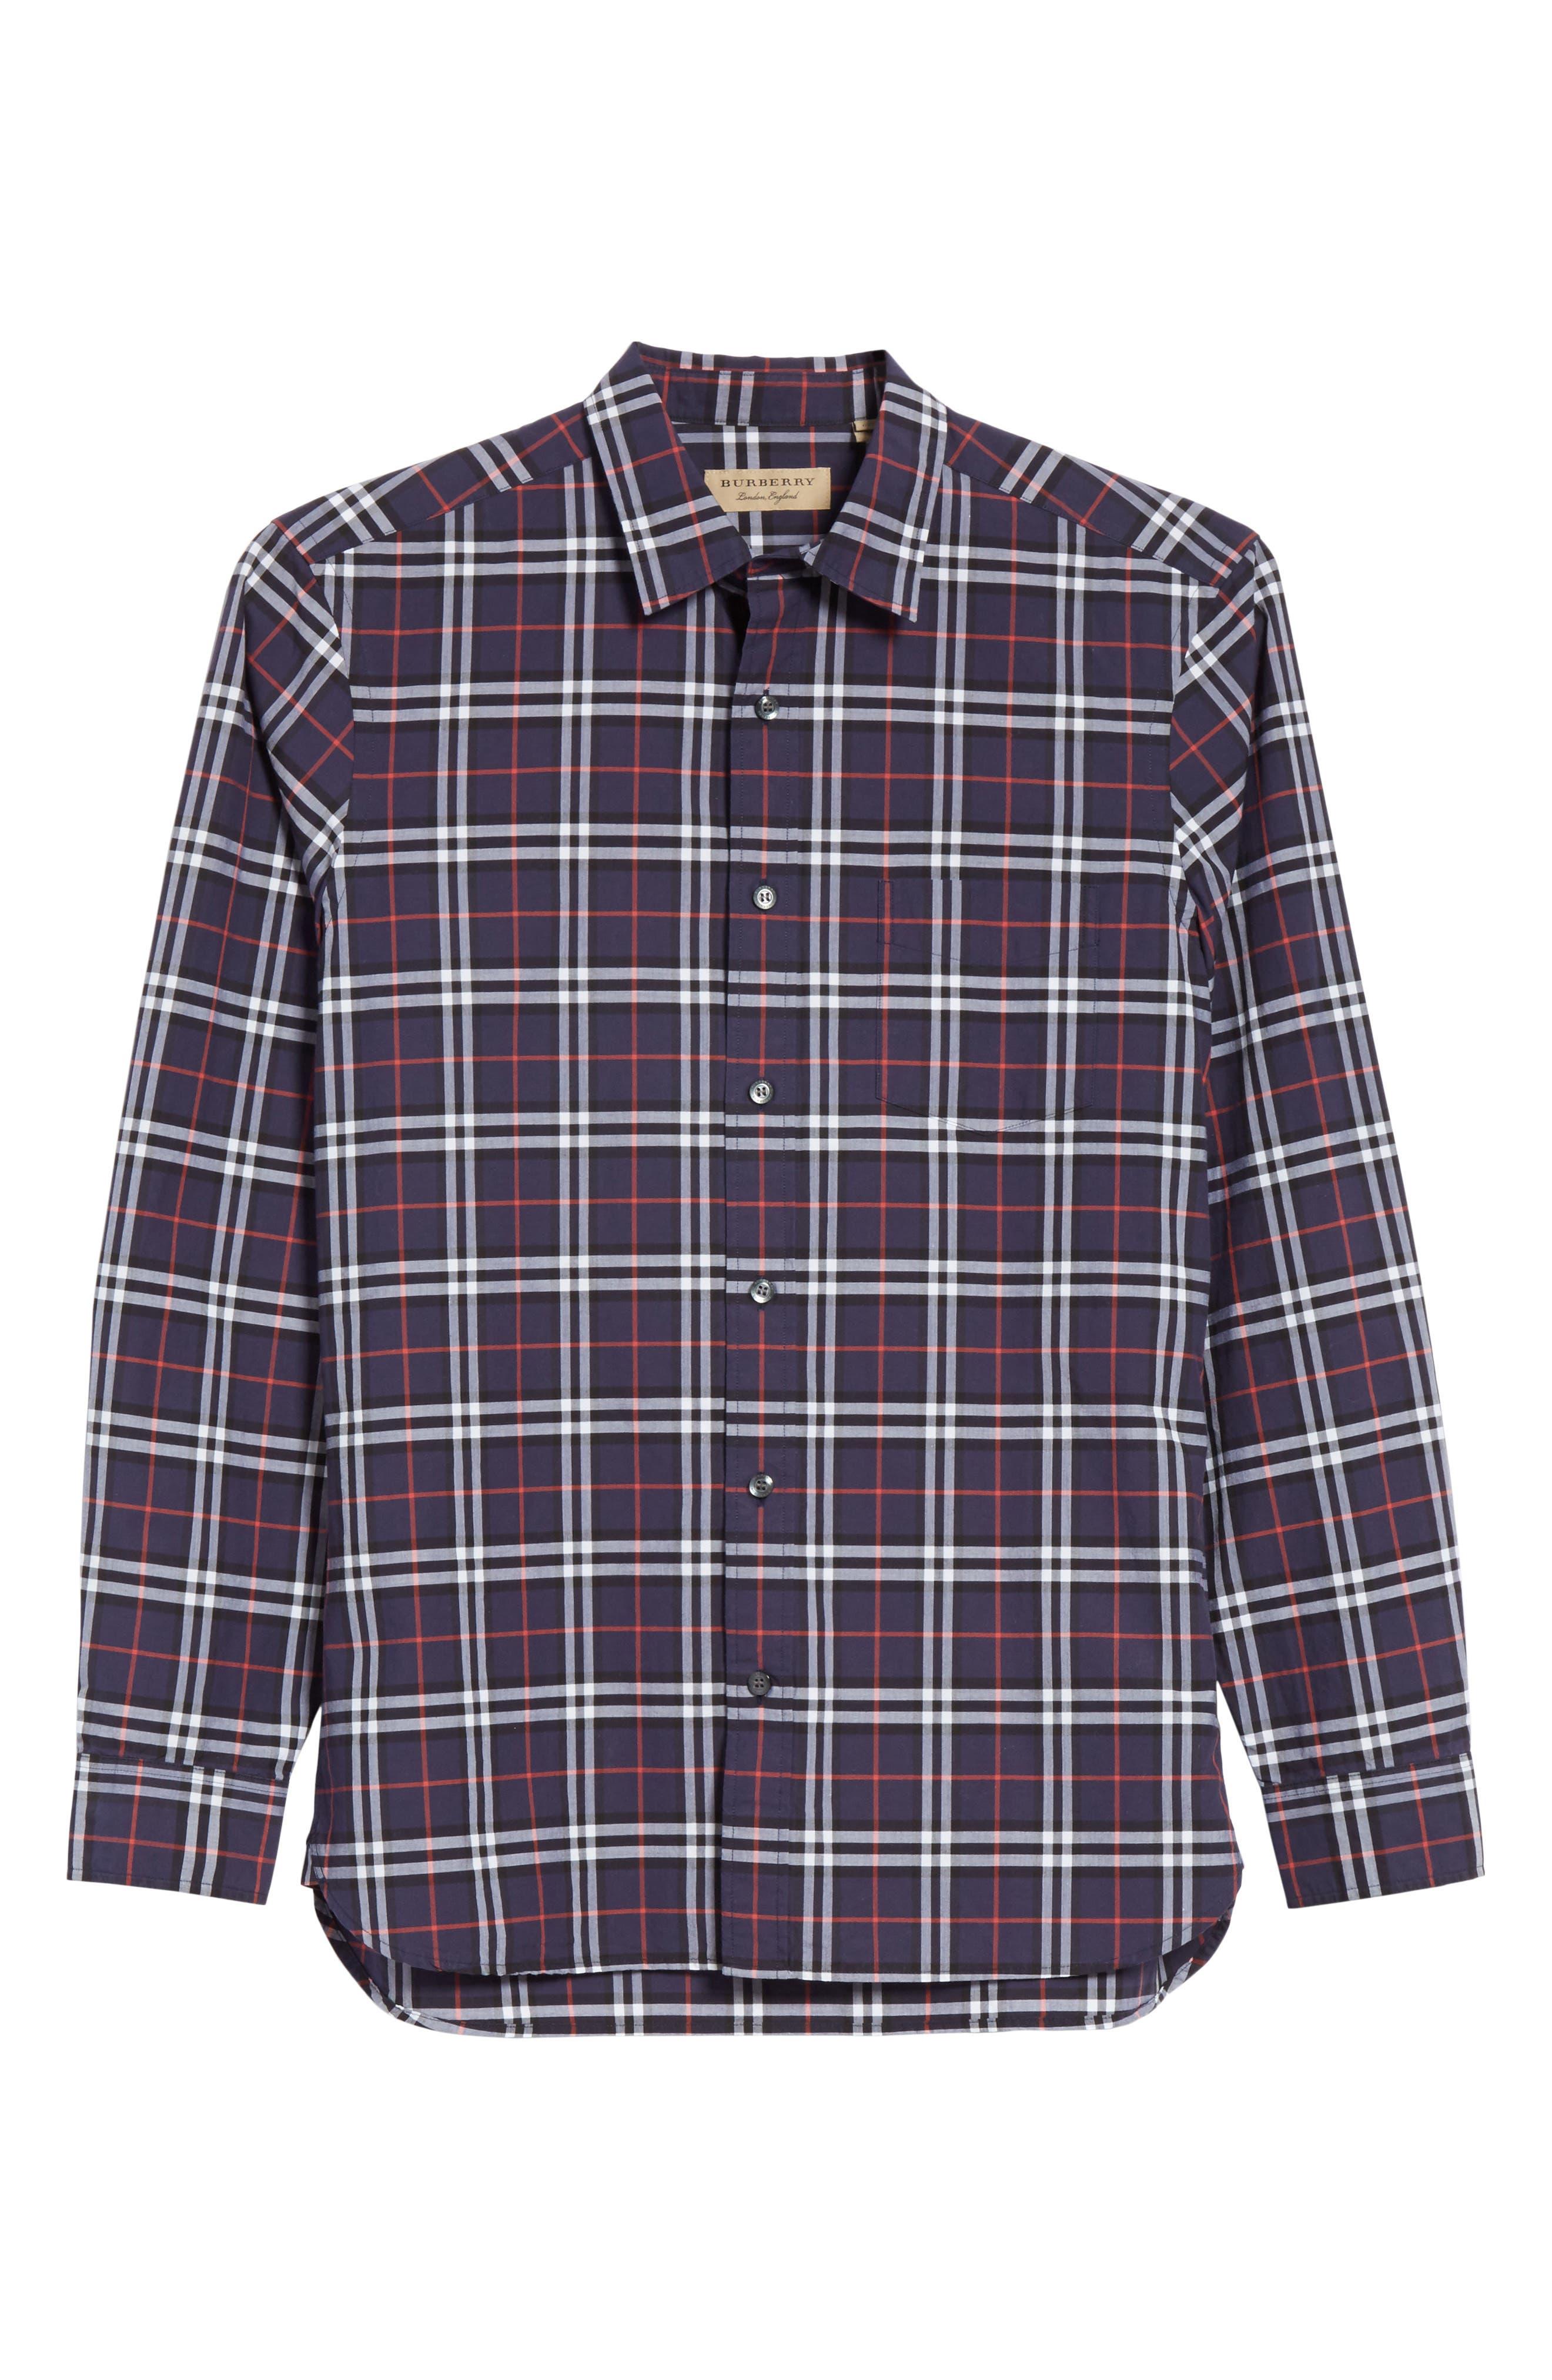 Alexander Check Sport Shirt,                             Alternate thumbnail 6, color,                             NAVY